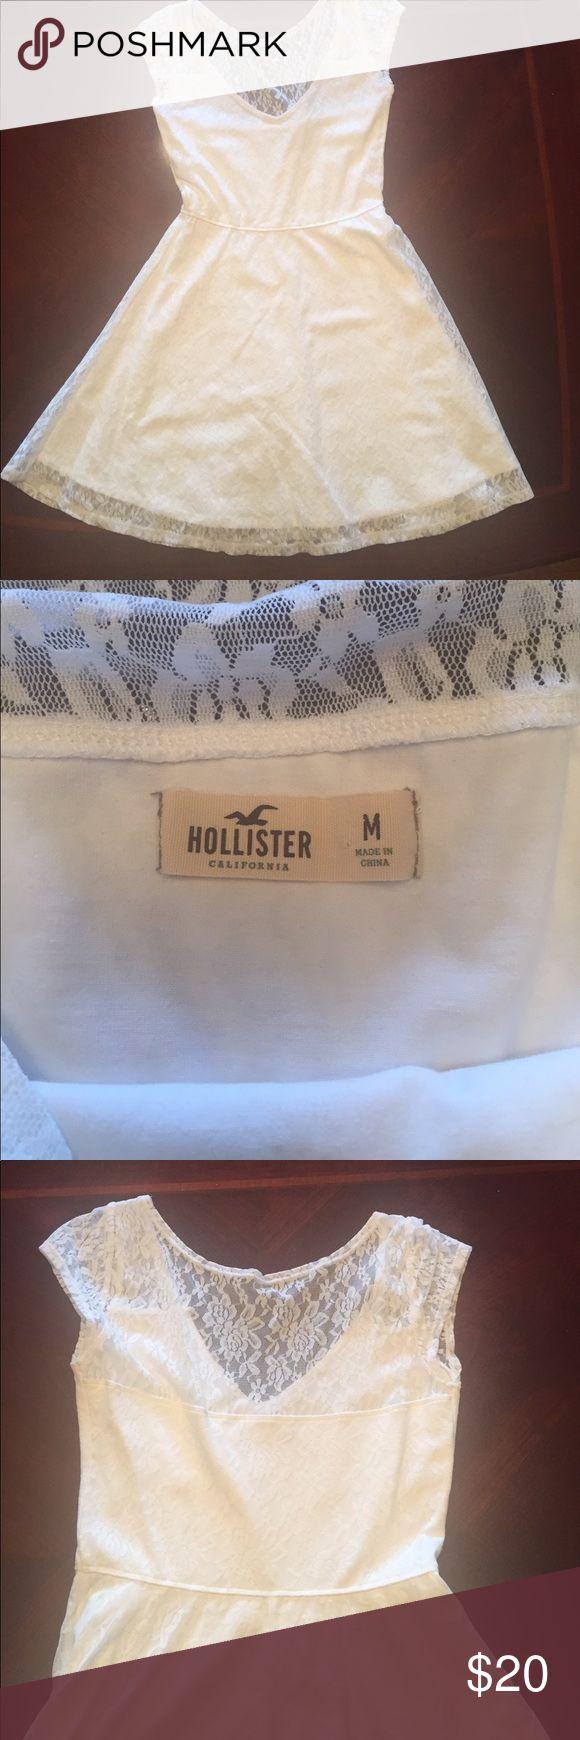 NWOT Hollister dress 😍😍 Beautiful new without tags Hollister dress. Hollister Dresses